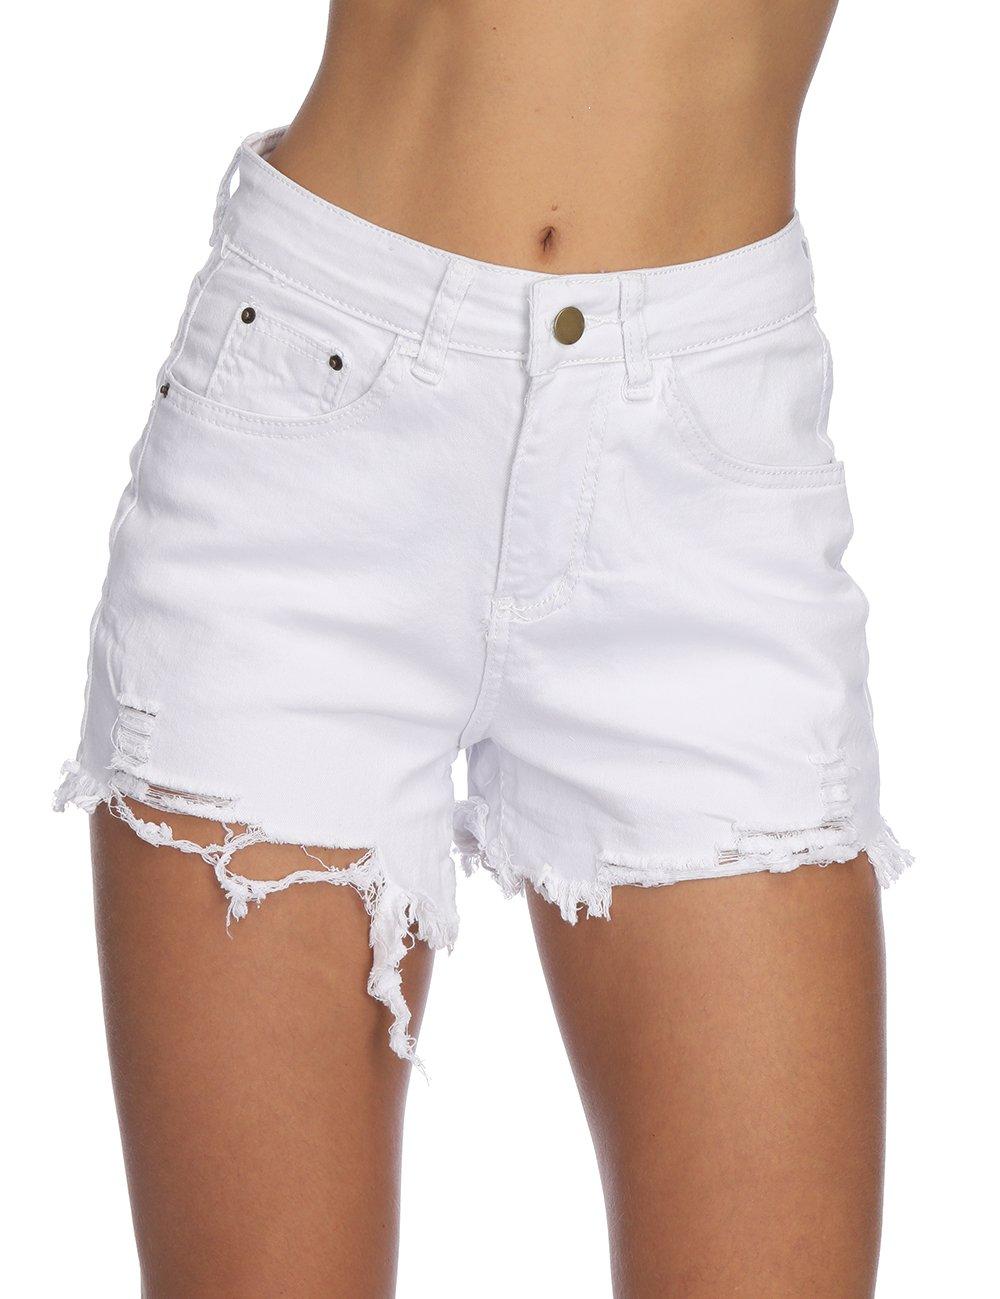 Haola Womens Denim Shorts Summer Stretchy Frayed Raw Hem Distressed Jeans Shorts White XL